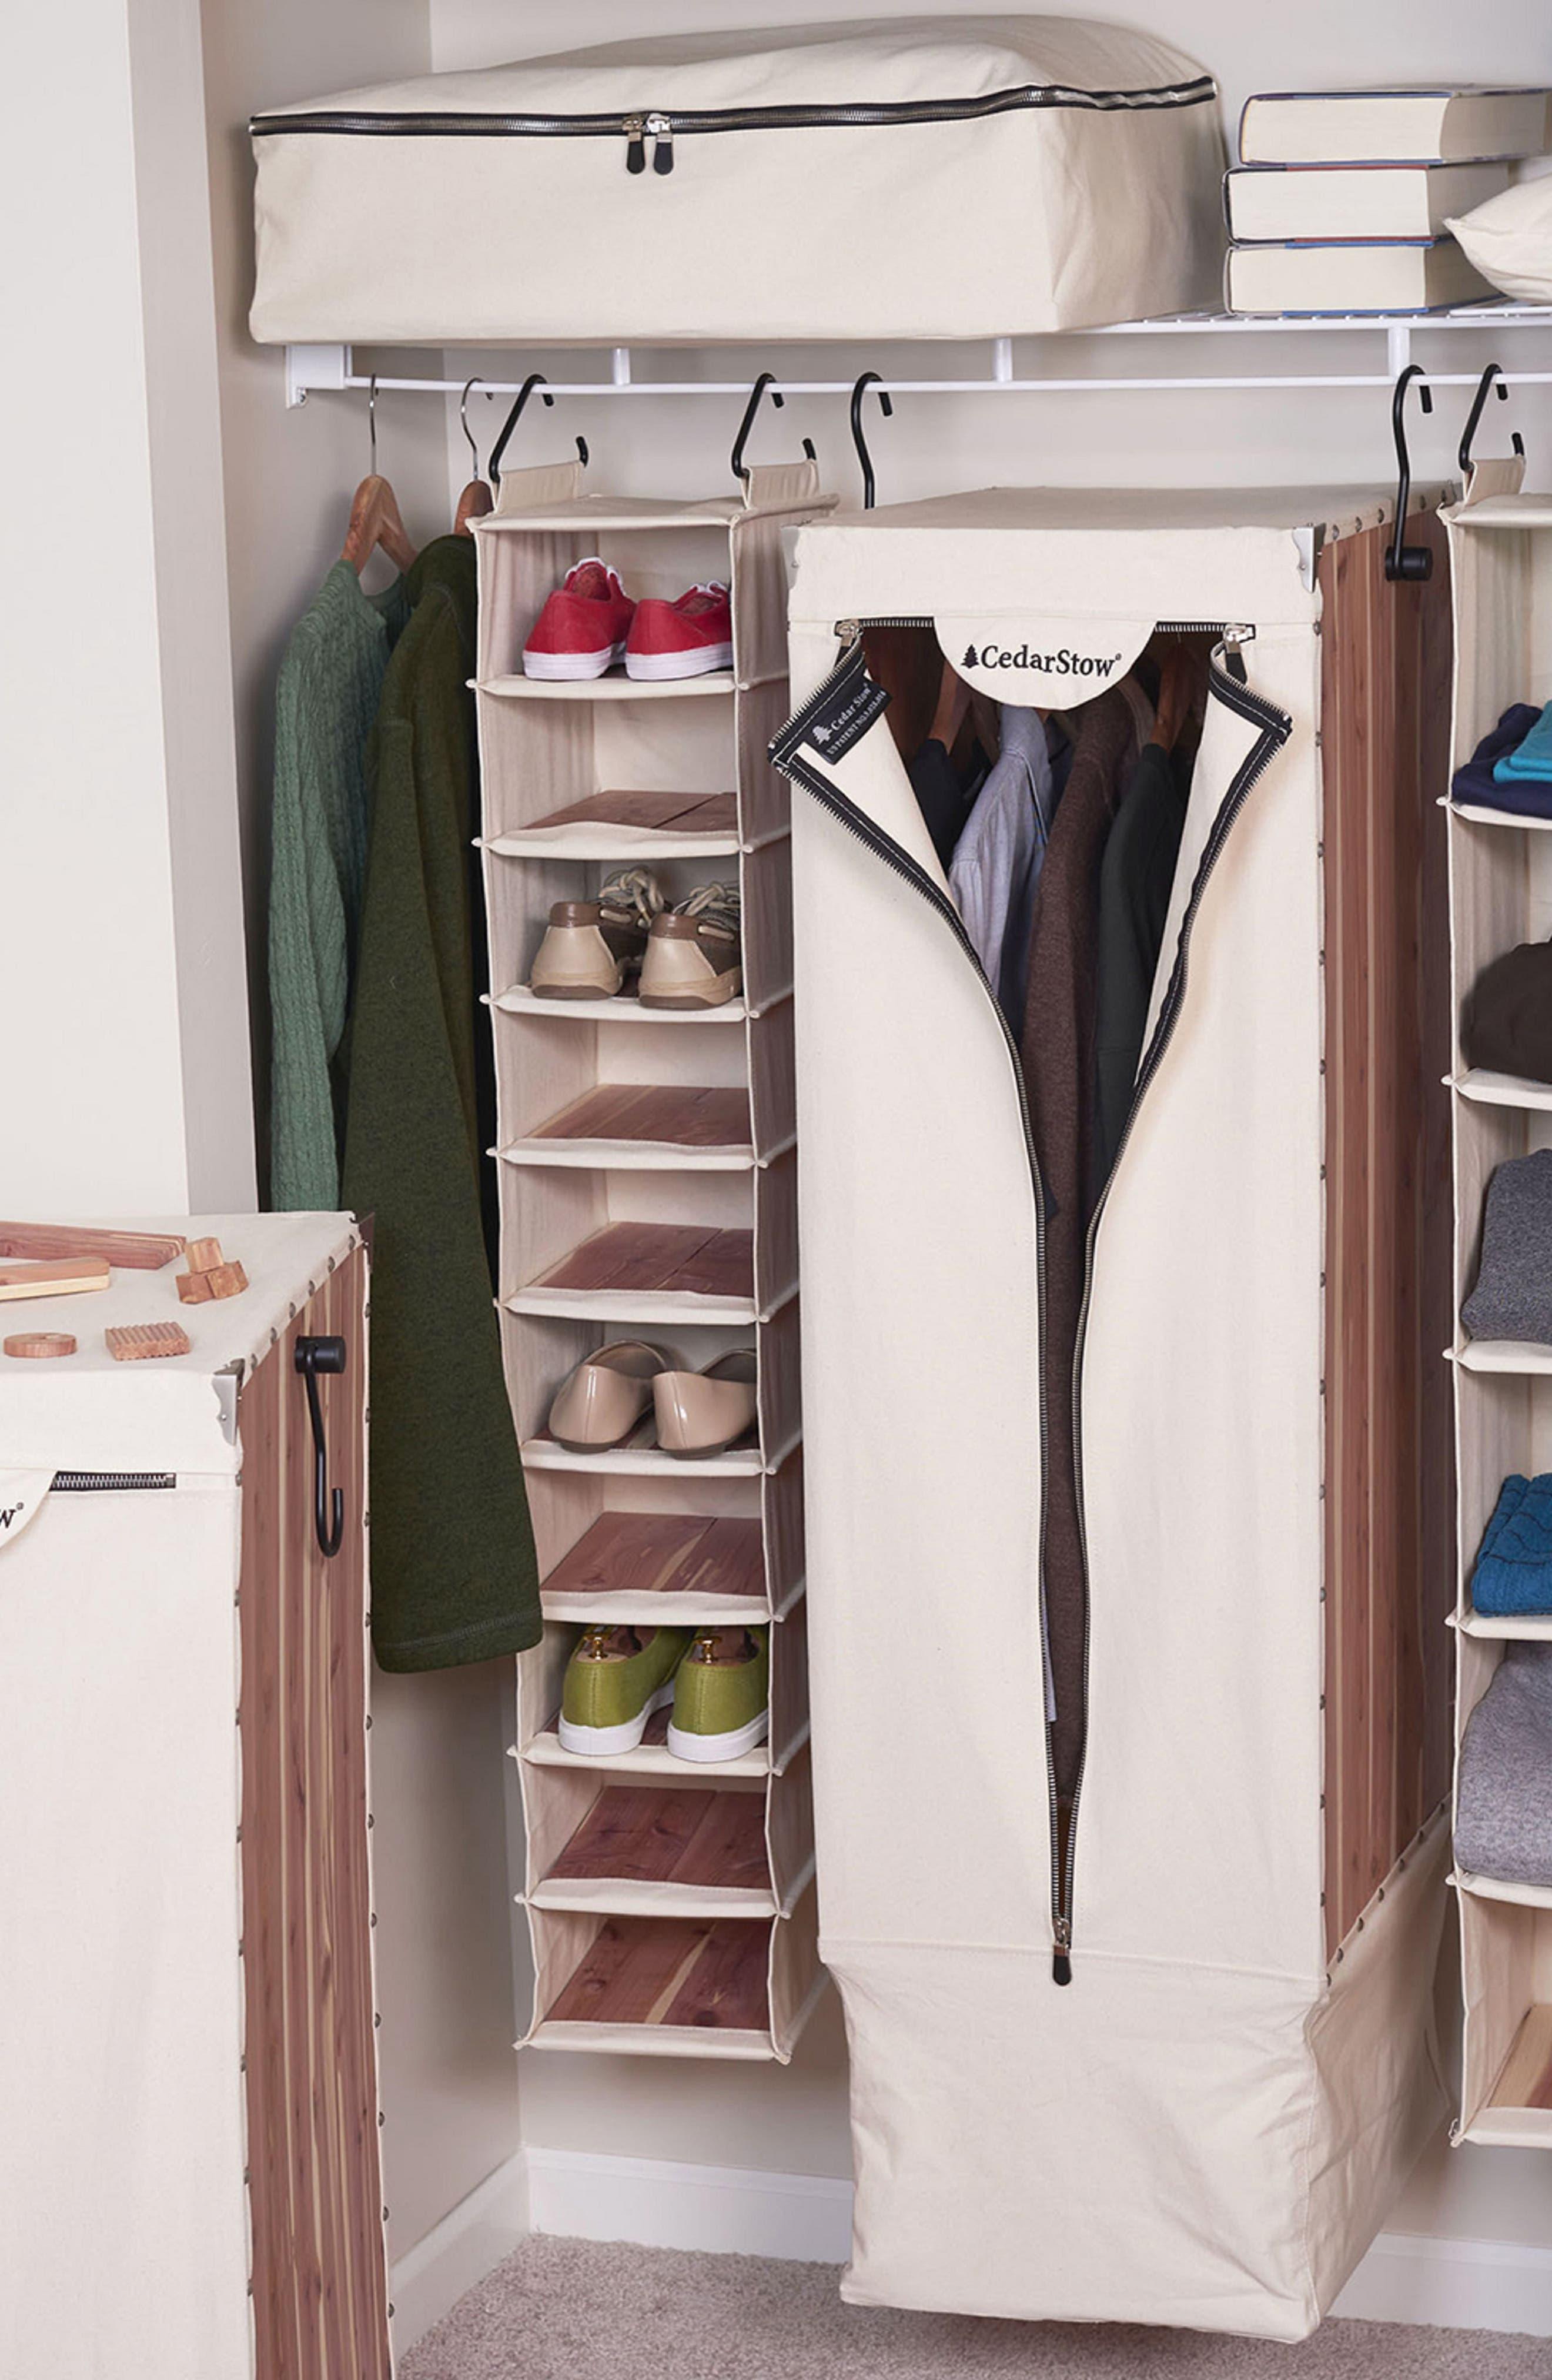 CedarStow Clothing Wardrobe,                             Alternate thumbnail 4, color,                             BEIGE AND CEDAR